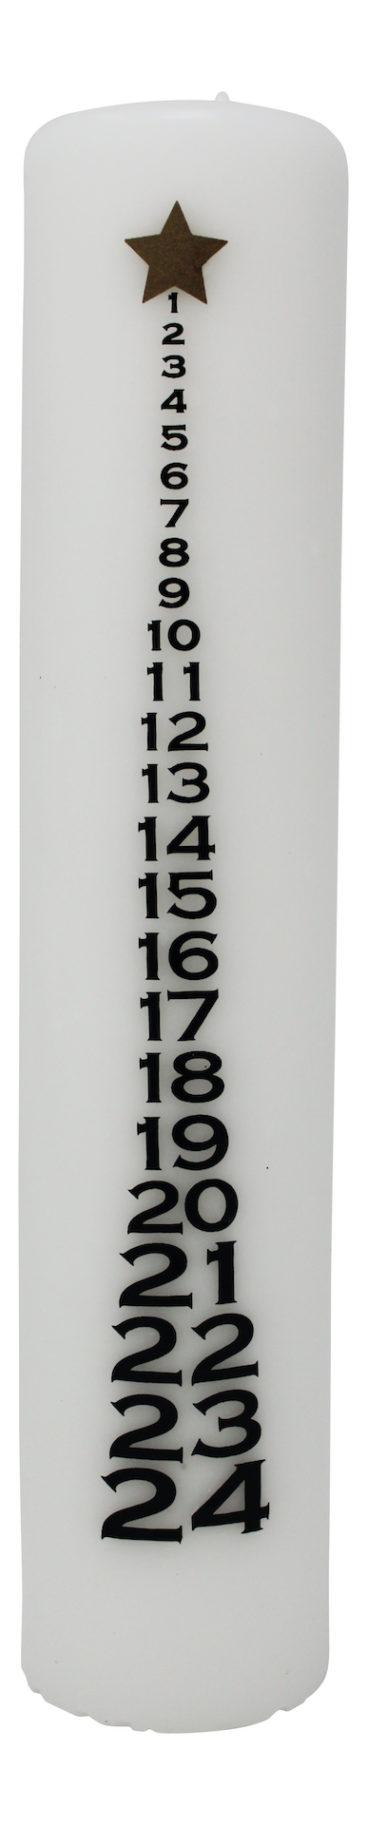 moderne-kalenderlys